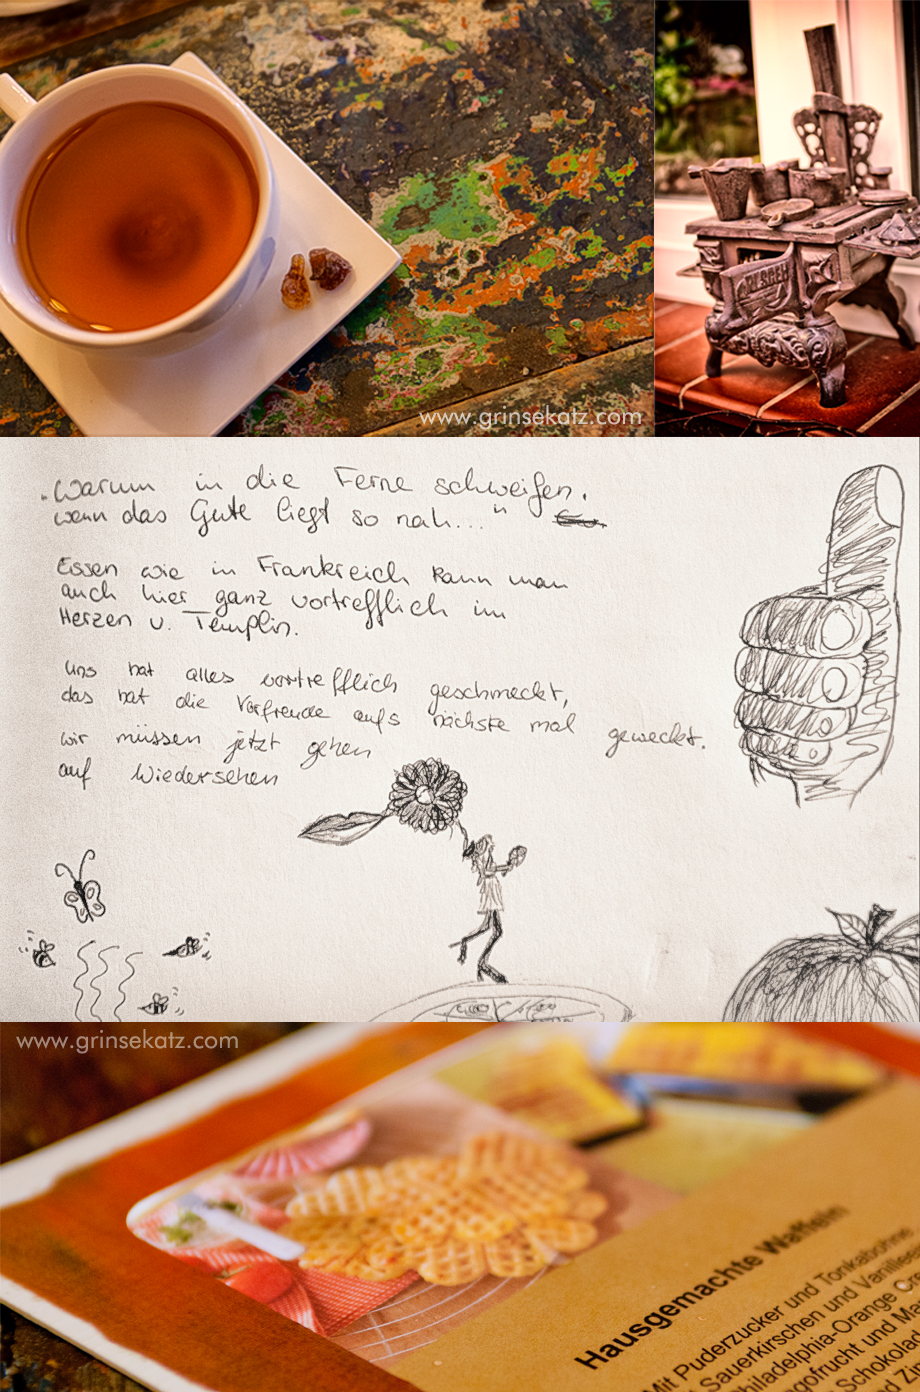 cafe-tee-templin-gastronomie-flammerie